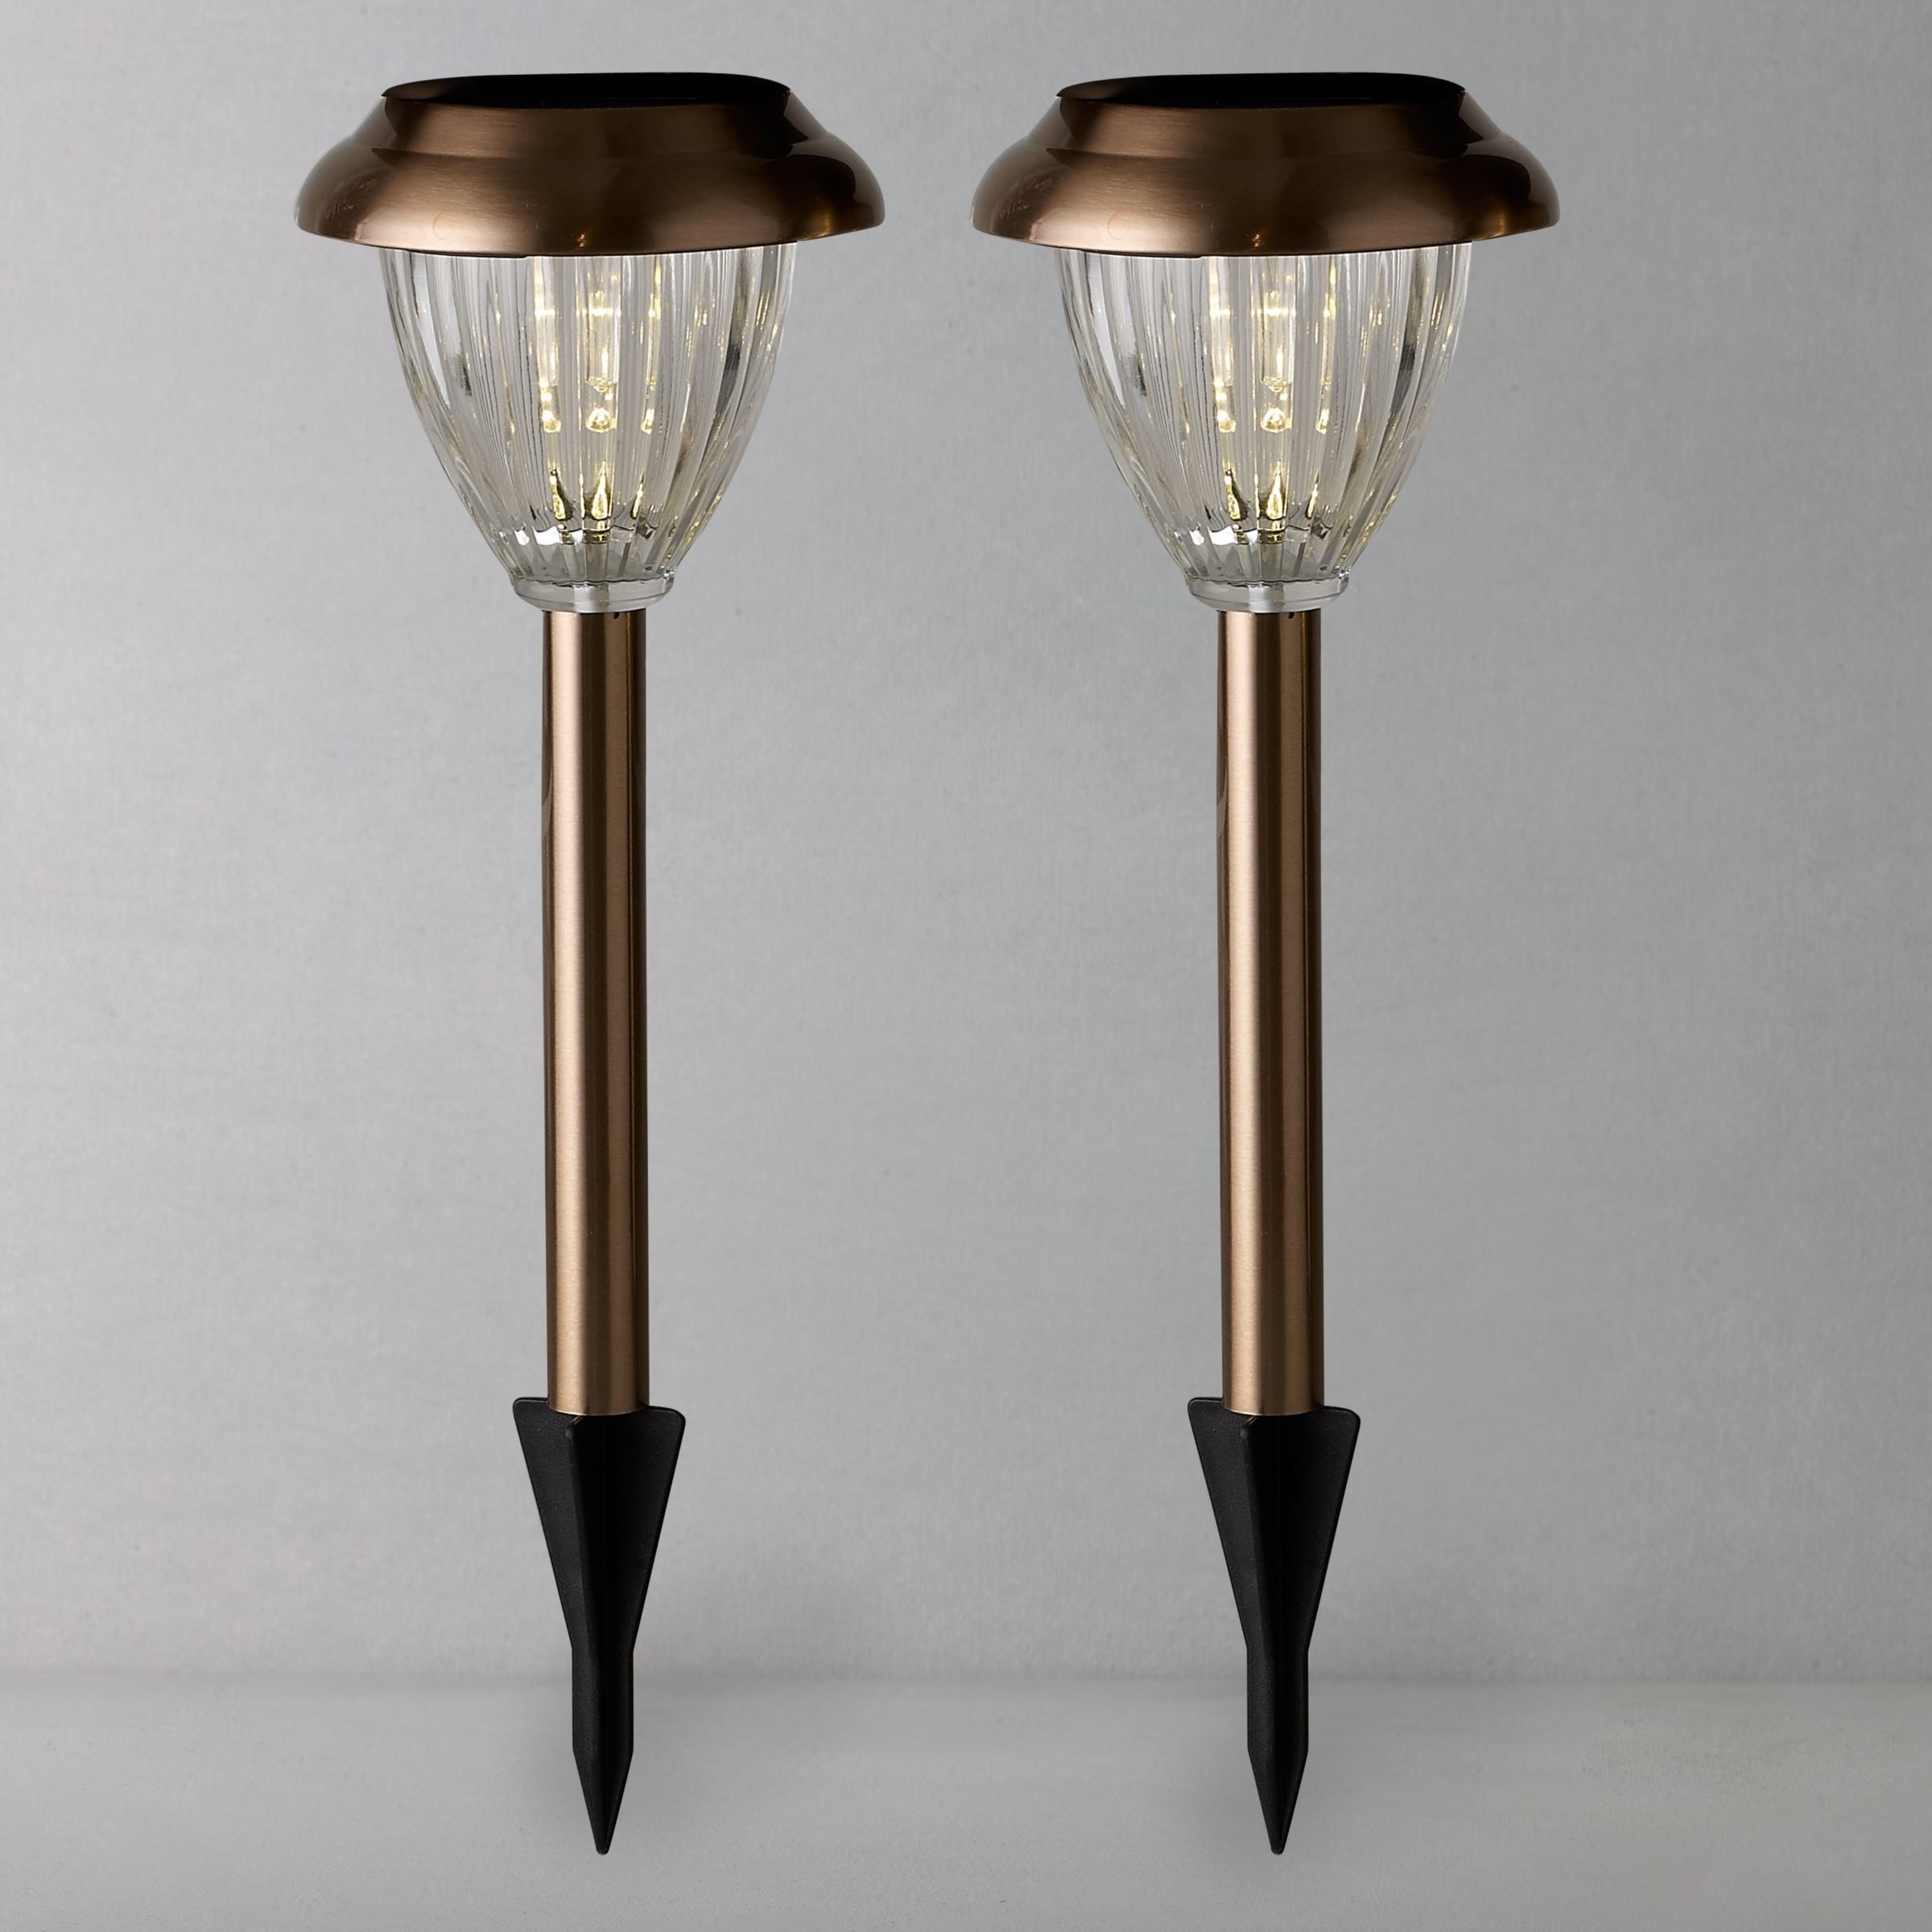 Buy John Lewis Bahia Solar Outdoor LED Stake Lights Copper Set